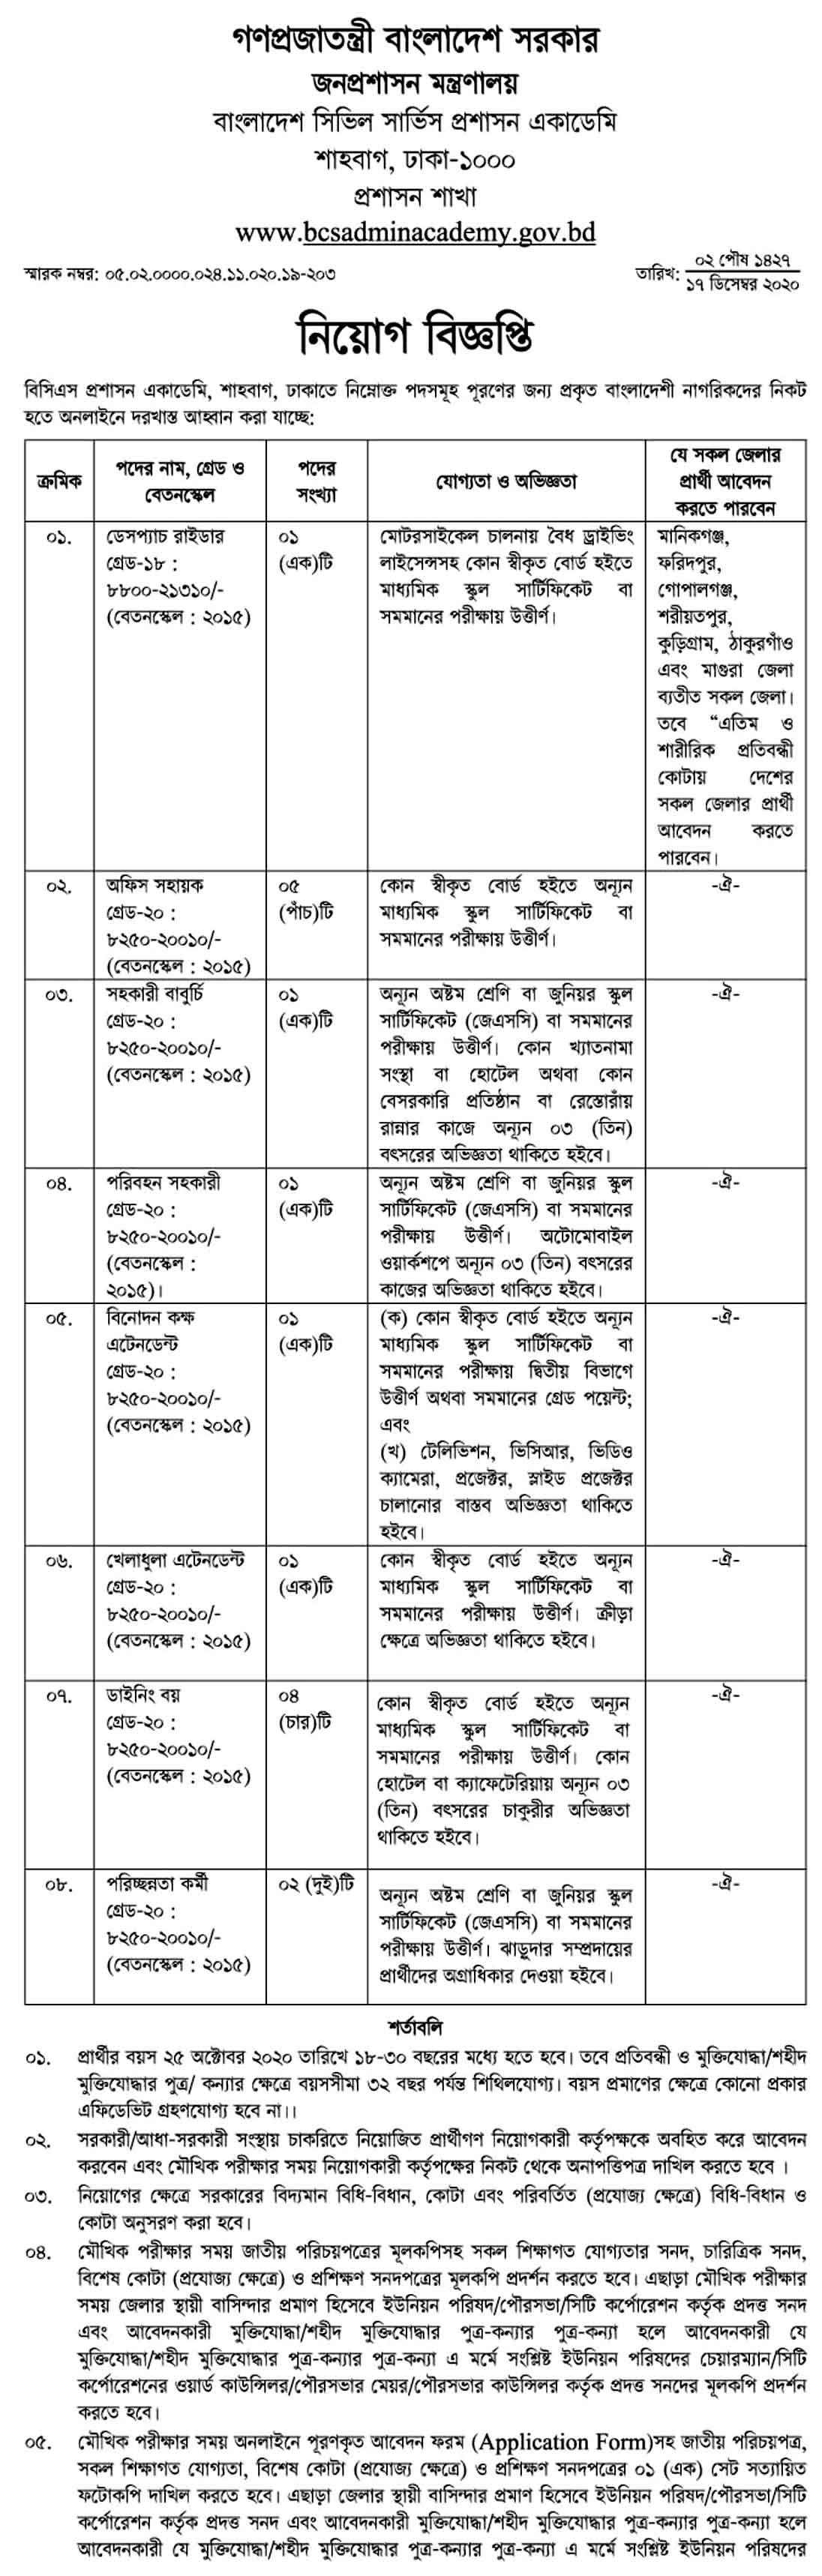 Bangladesh Civil Service Administration Academy BCSAA Job Circular